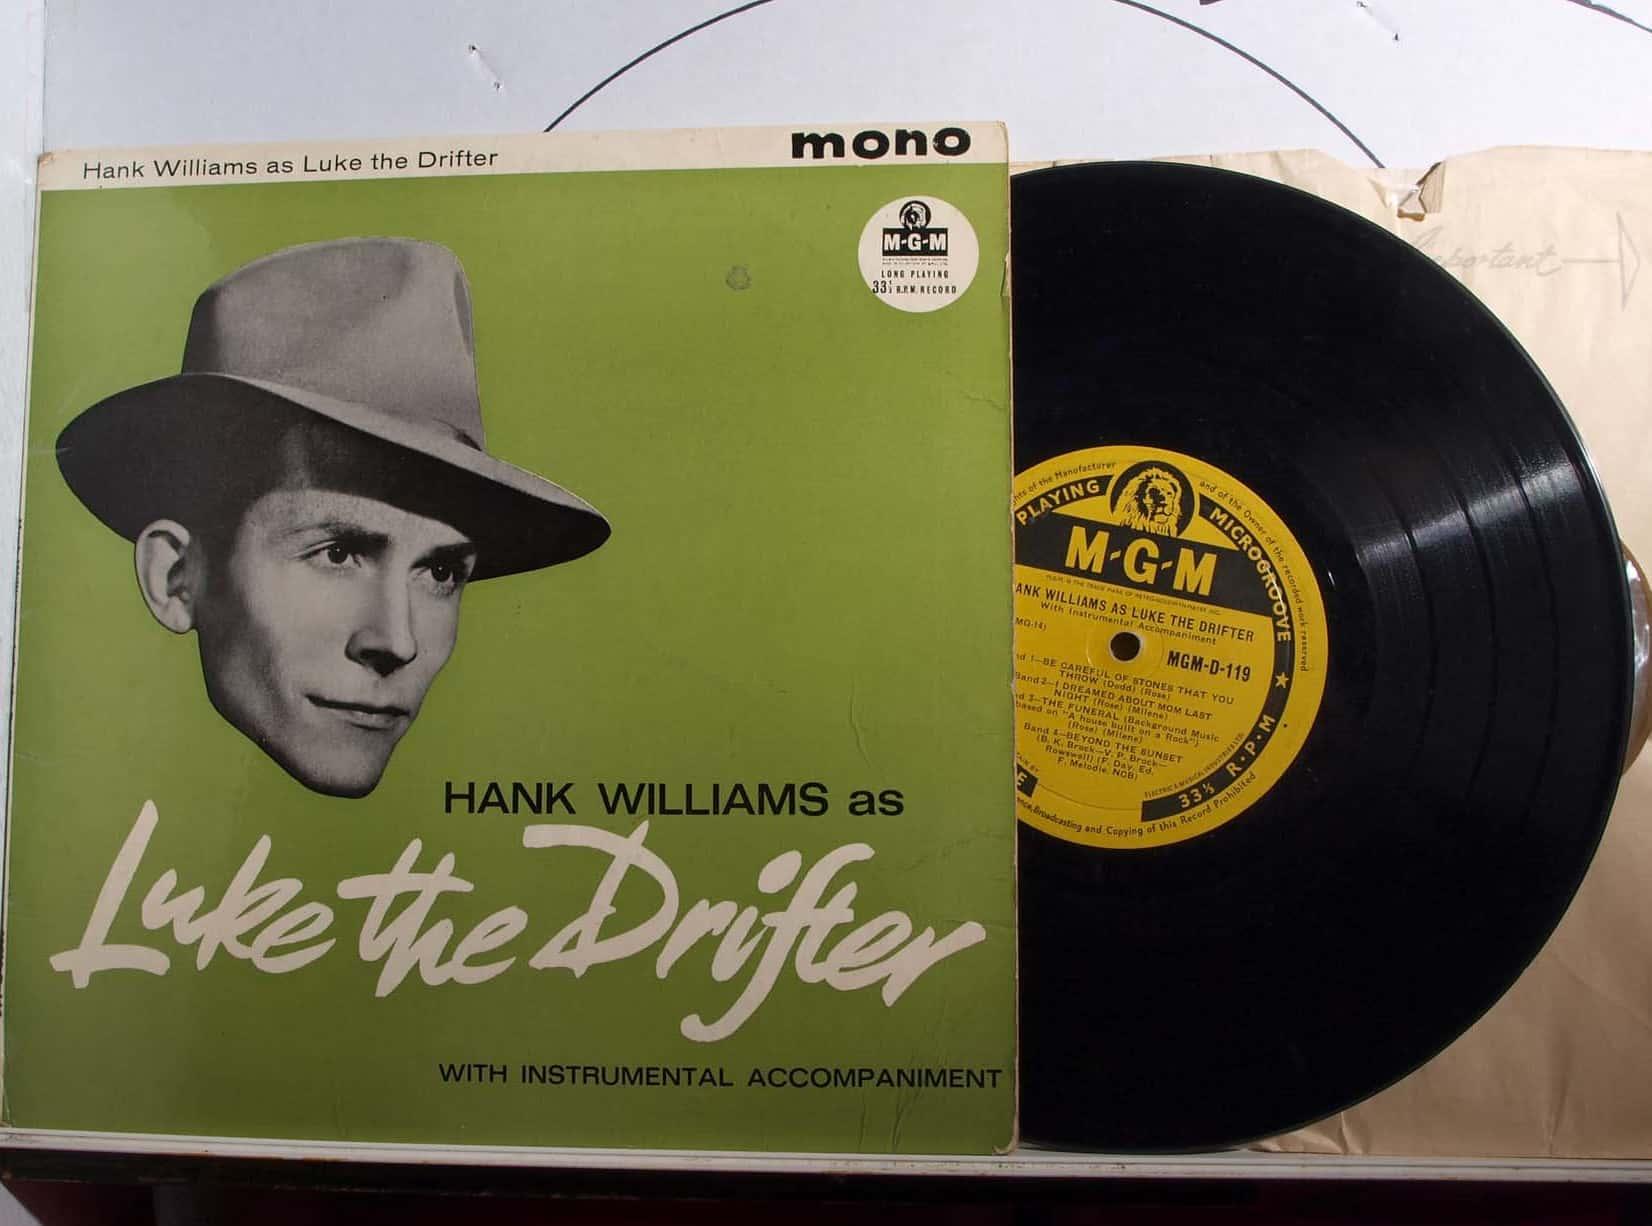 Hank Williams facts